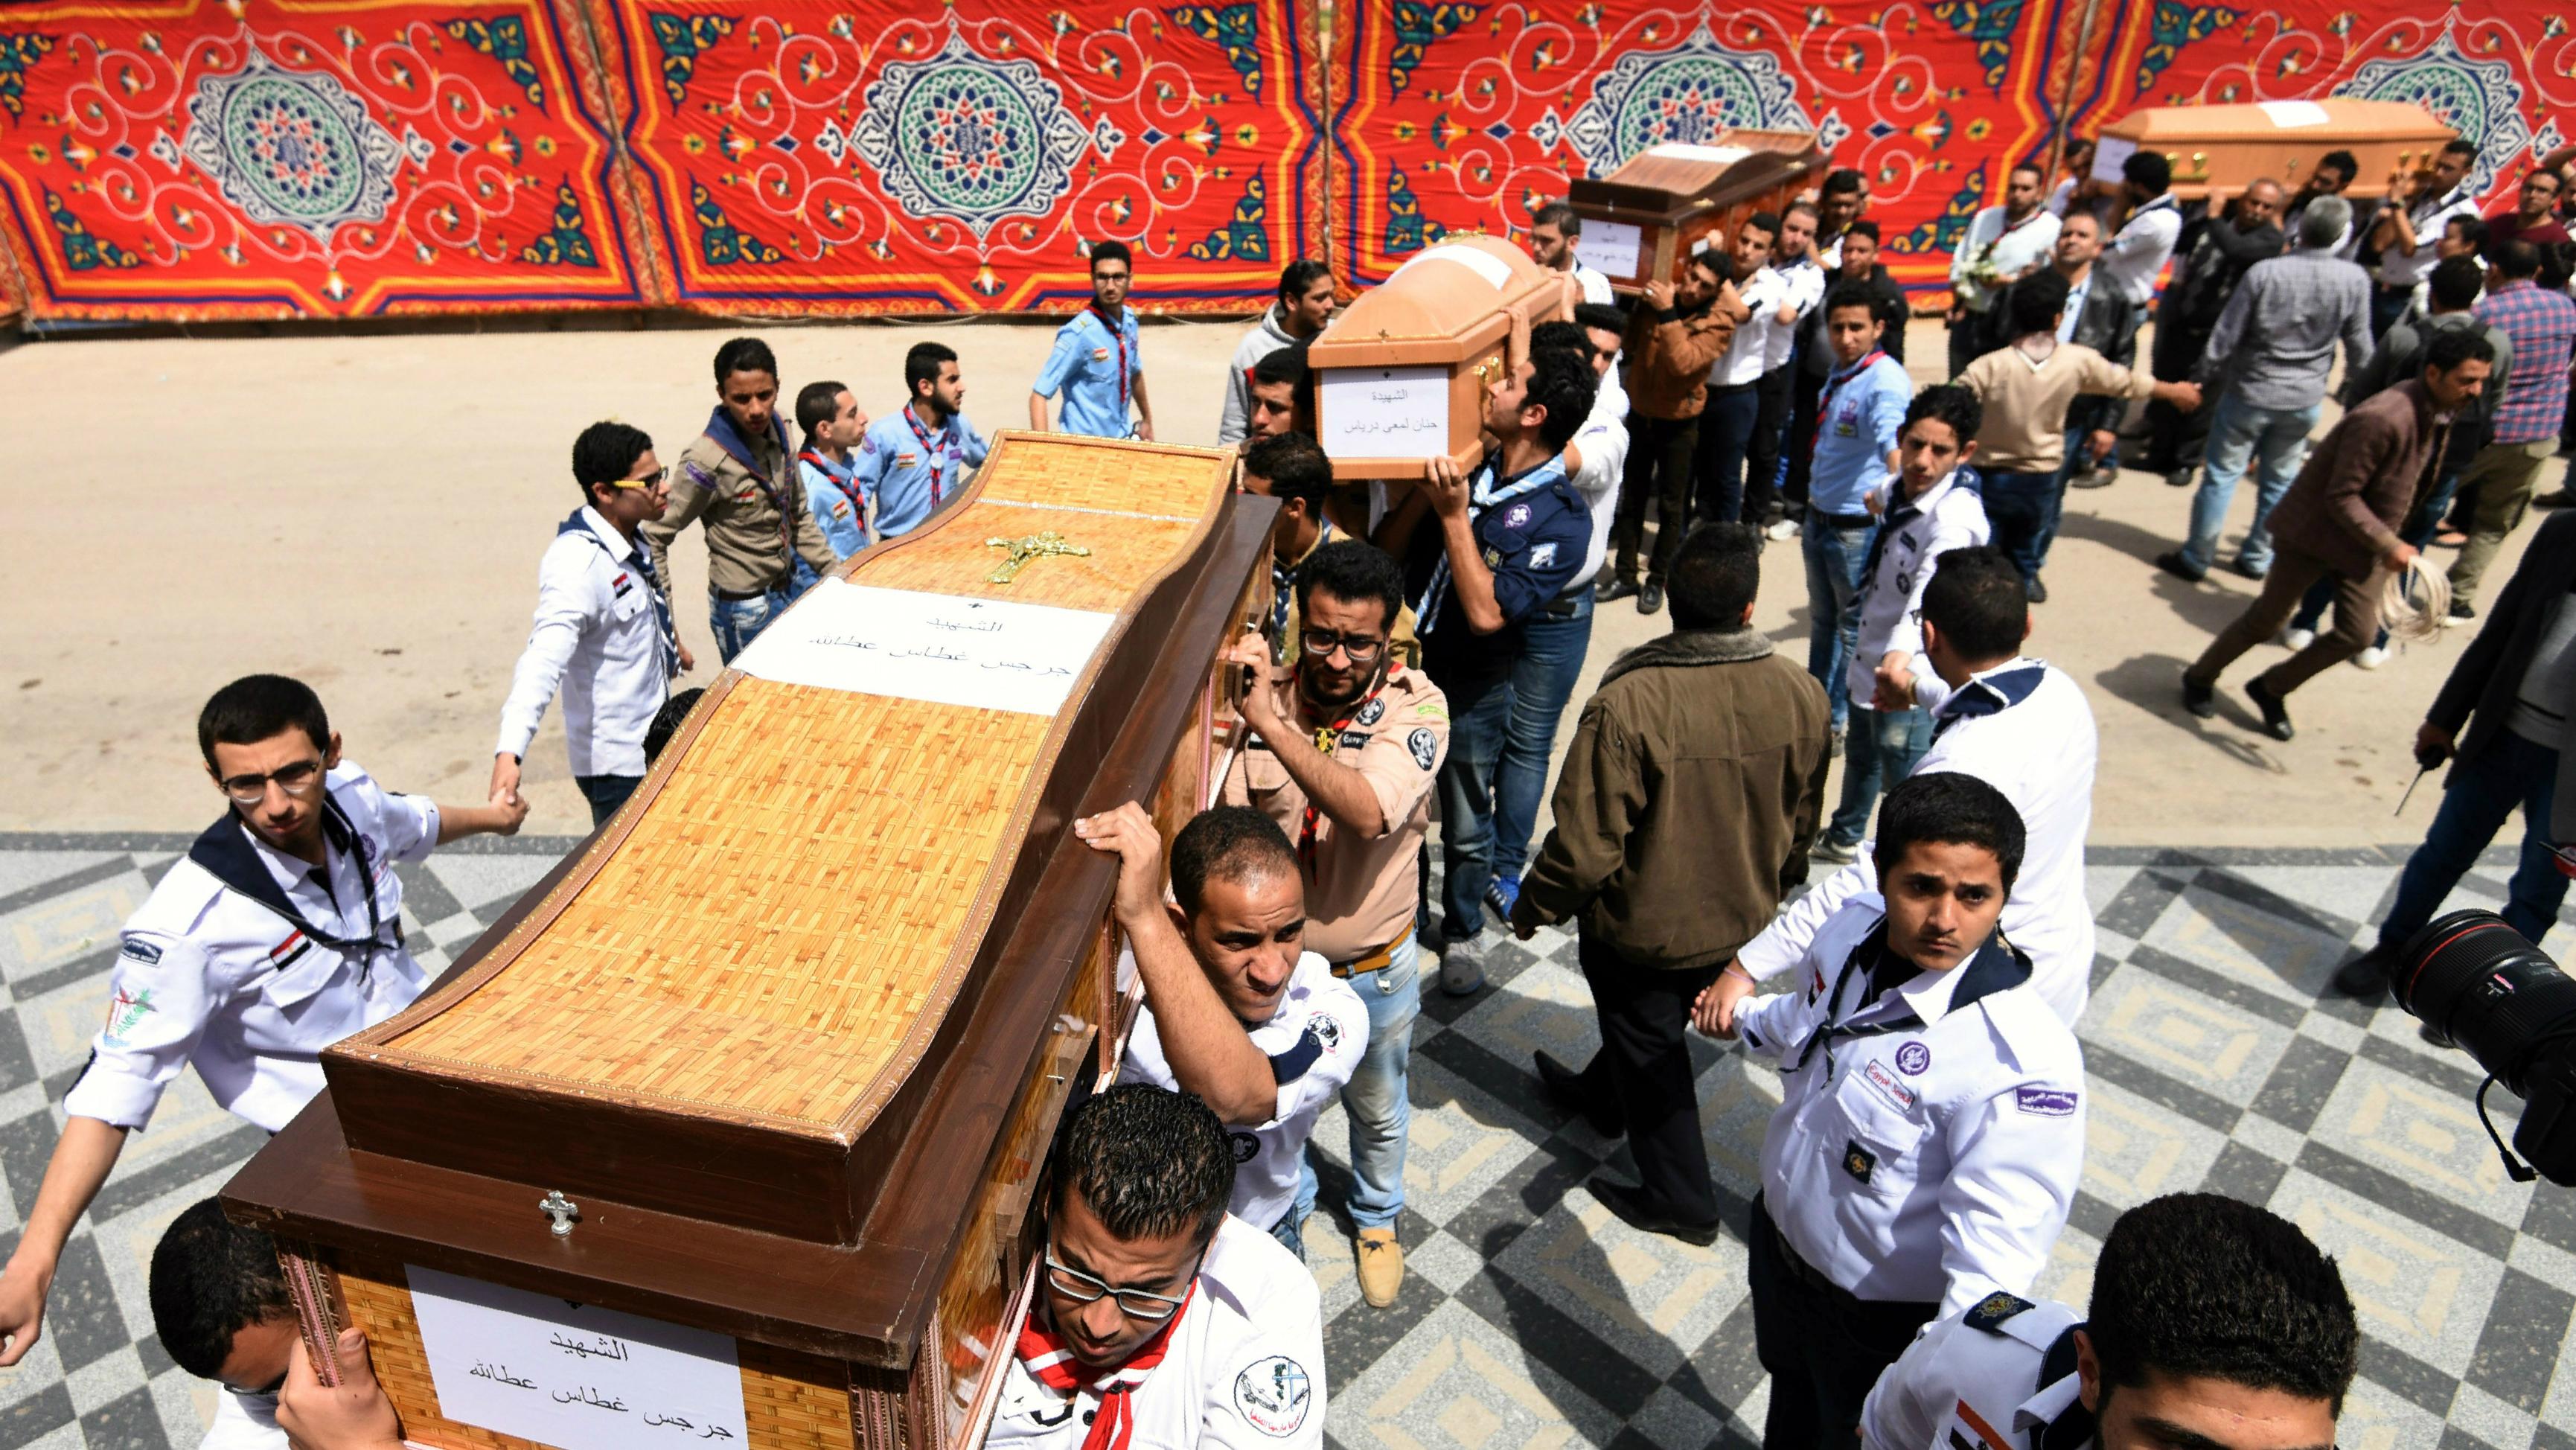 Dating an arab muslim man buries